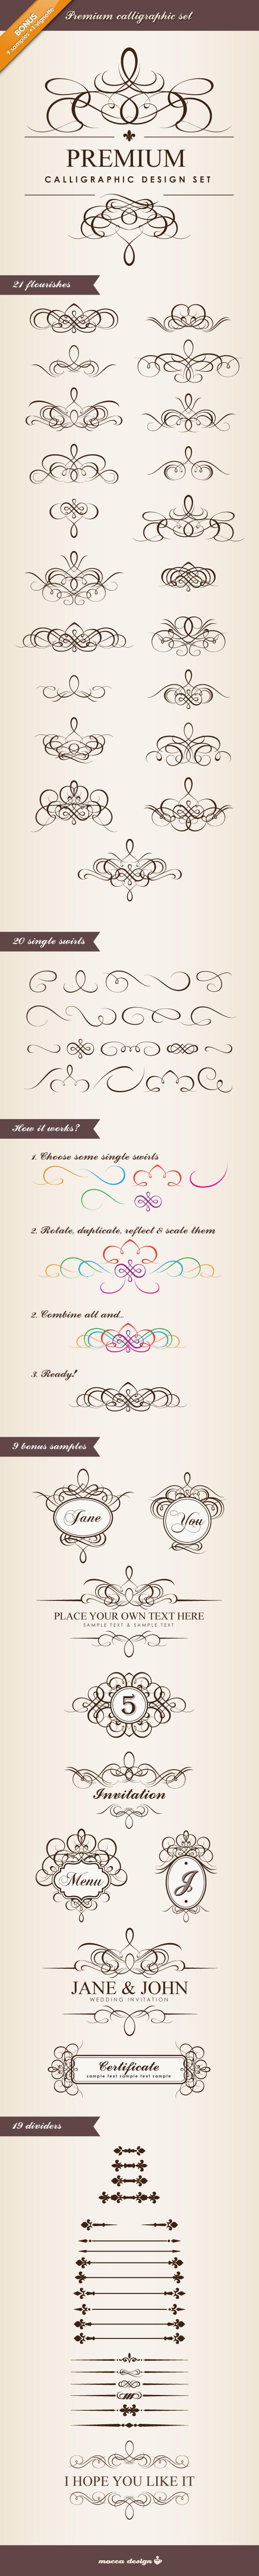 Premium Calligraphic Design Set by moccadsgn